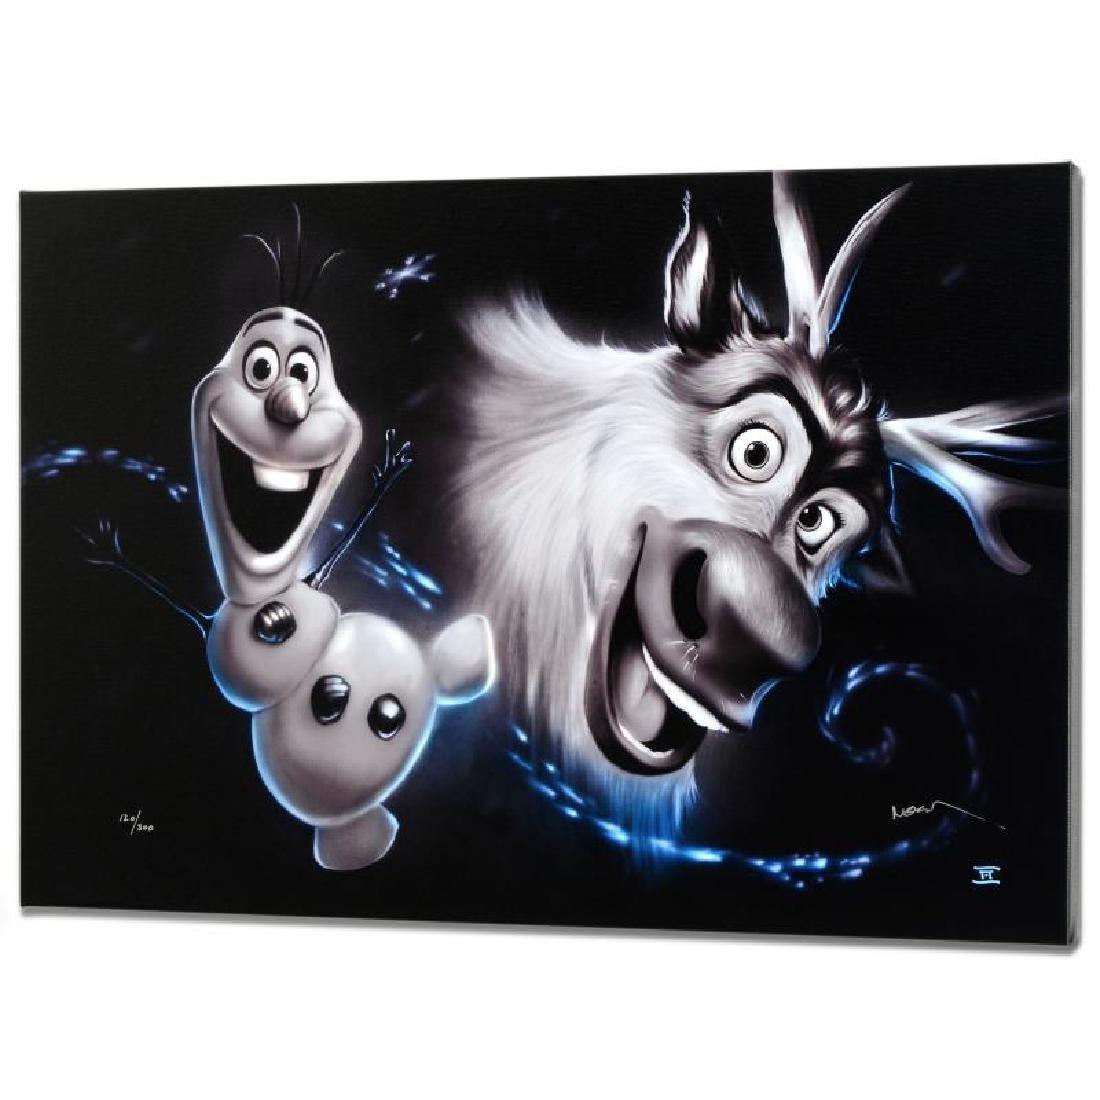 Olaf & Sven by Noah